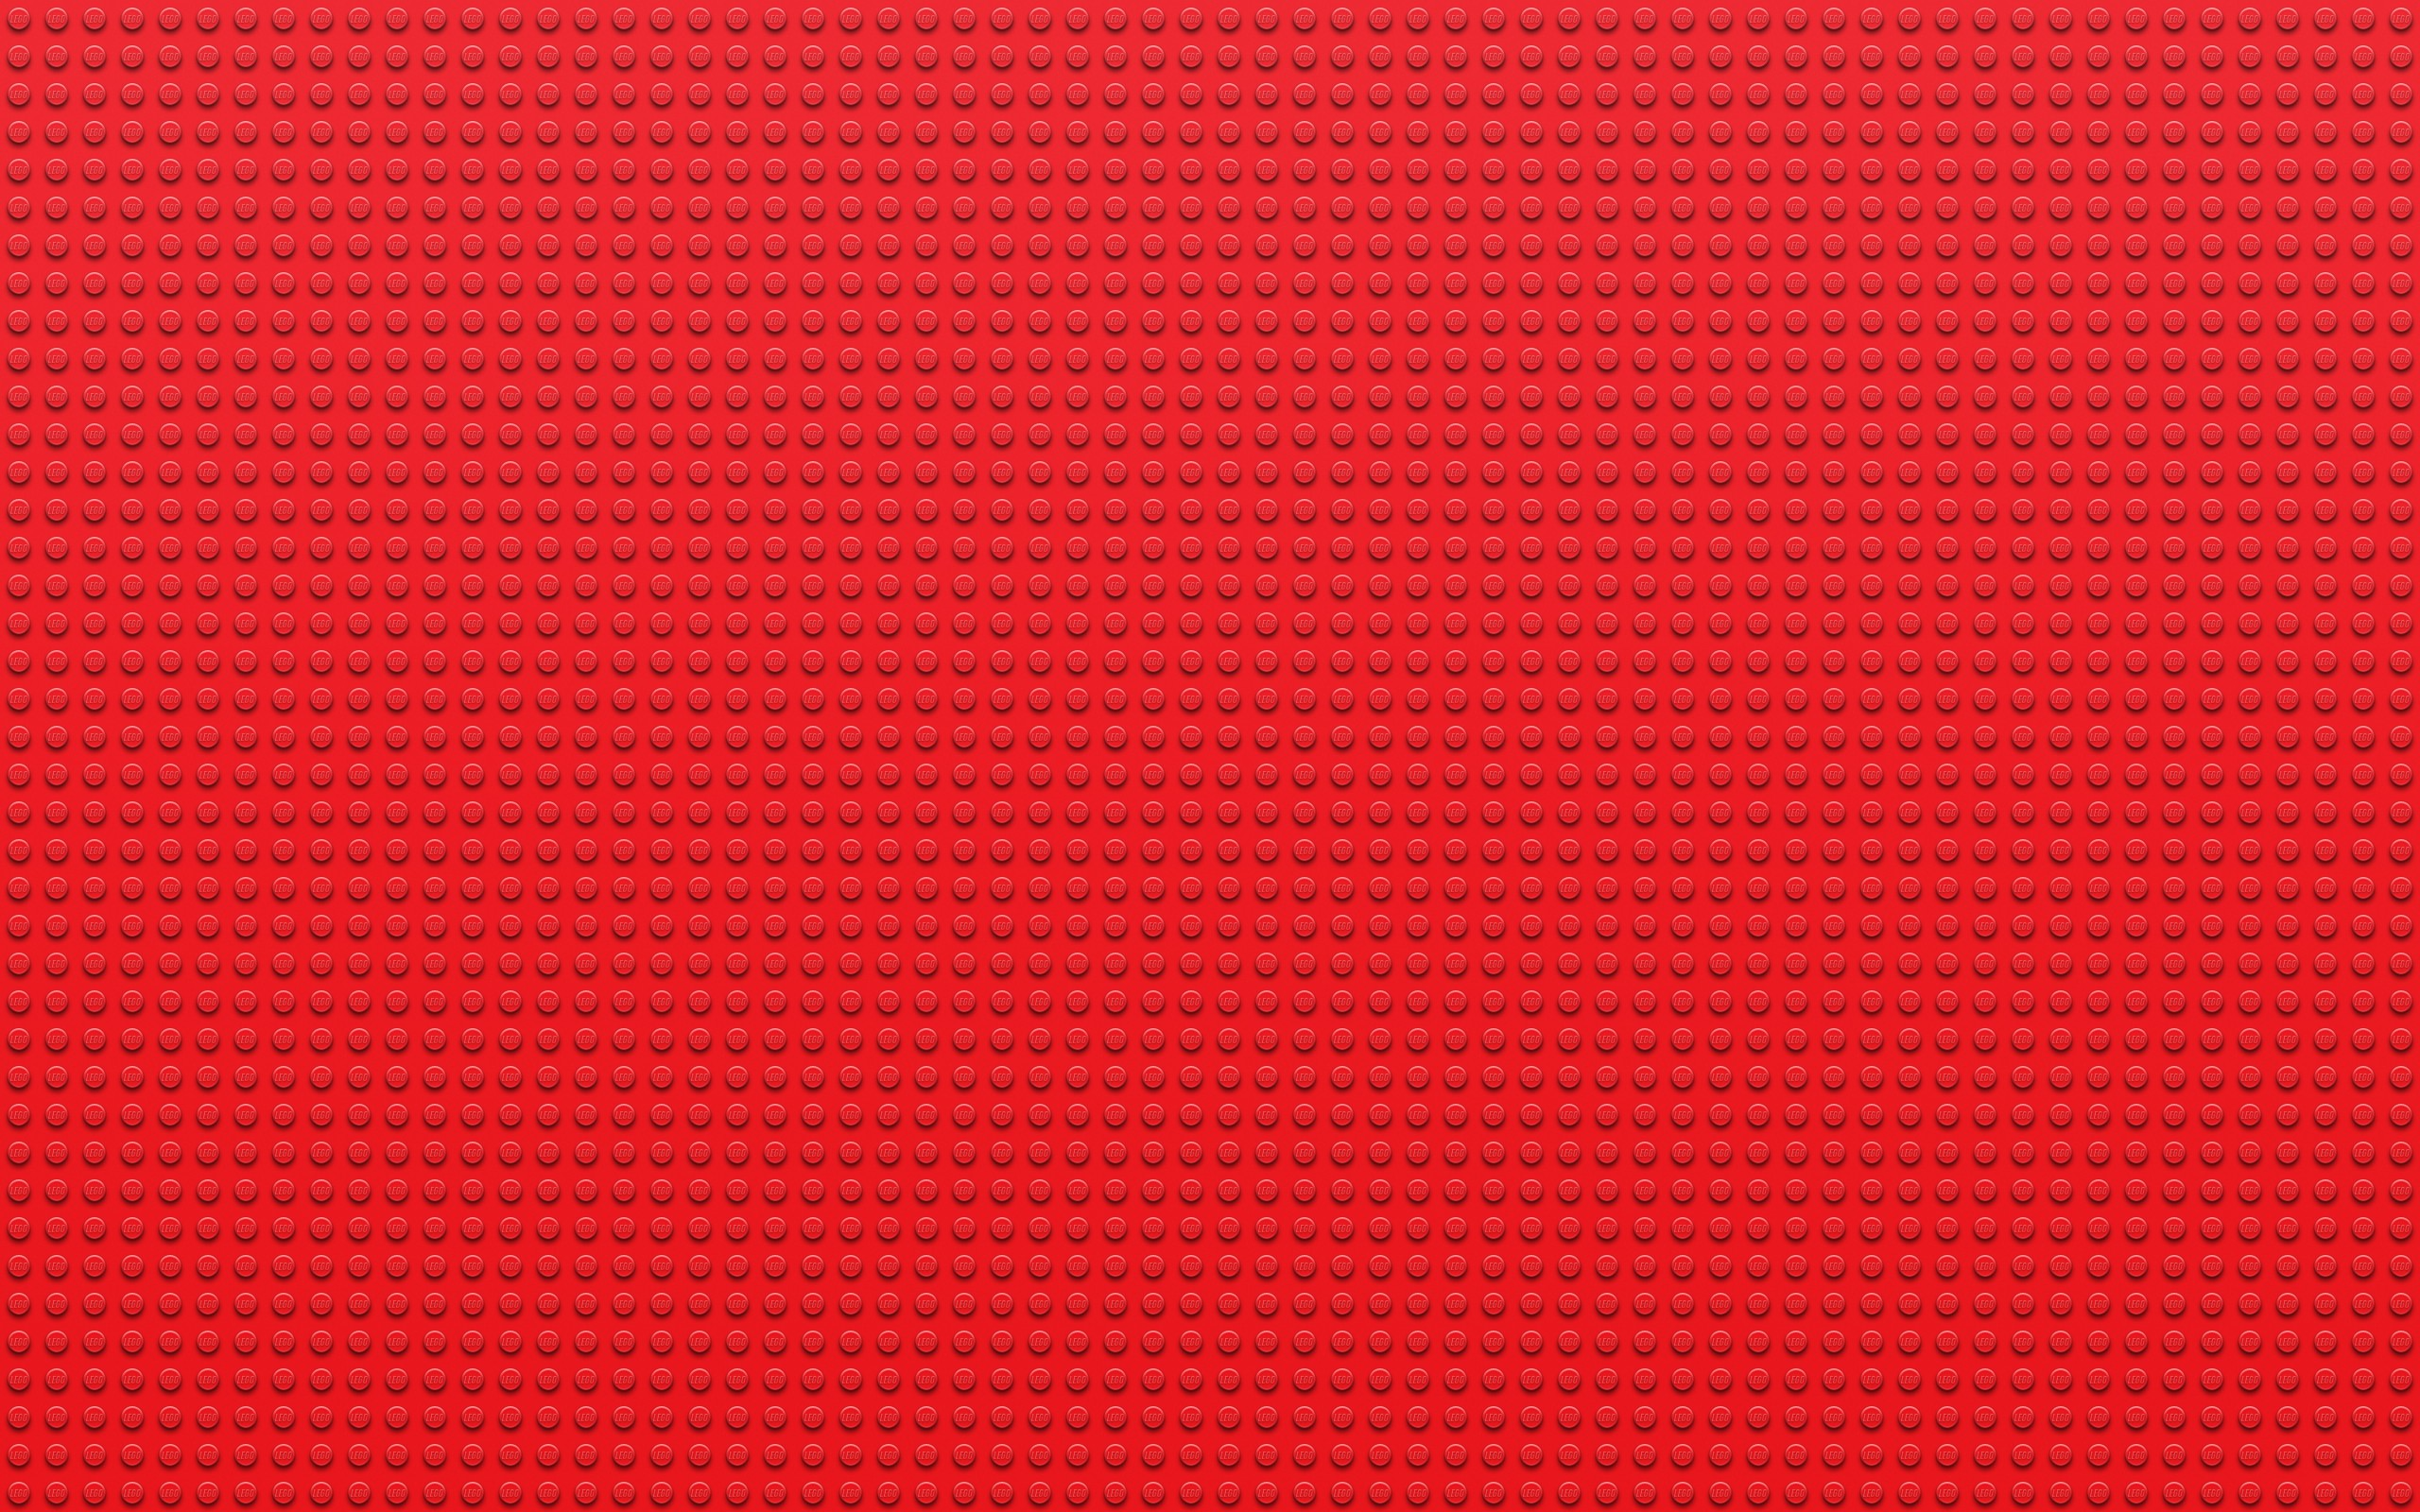 Lego red textures dots wallpaper 2560x1600 12187 WallpaperUP 2560x1600